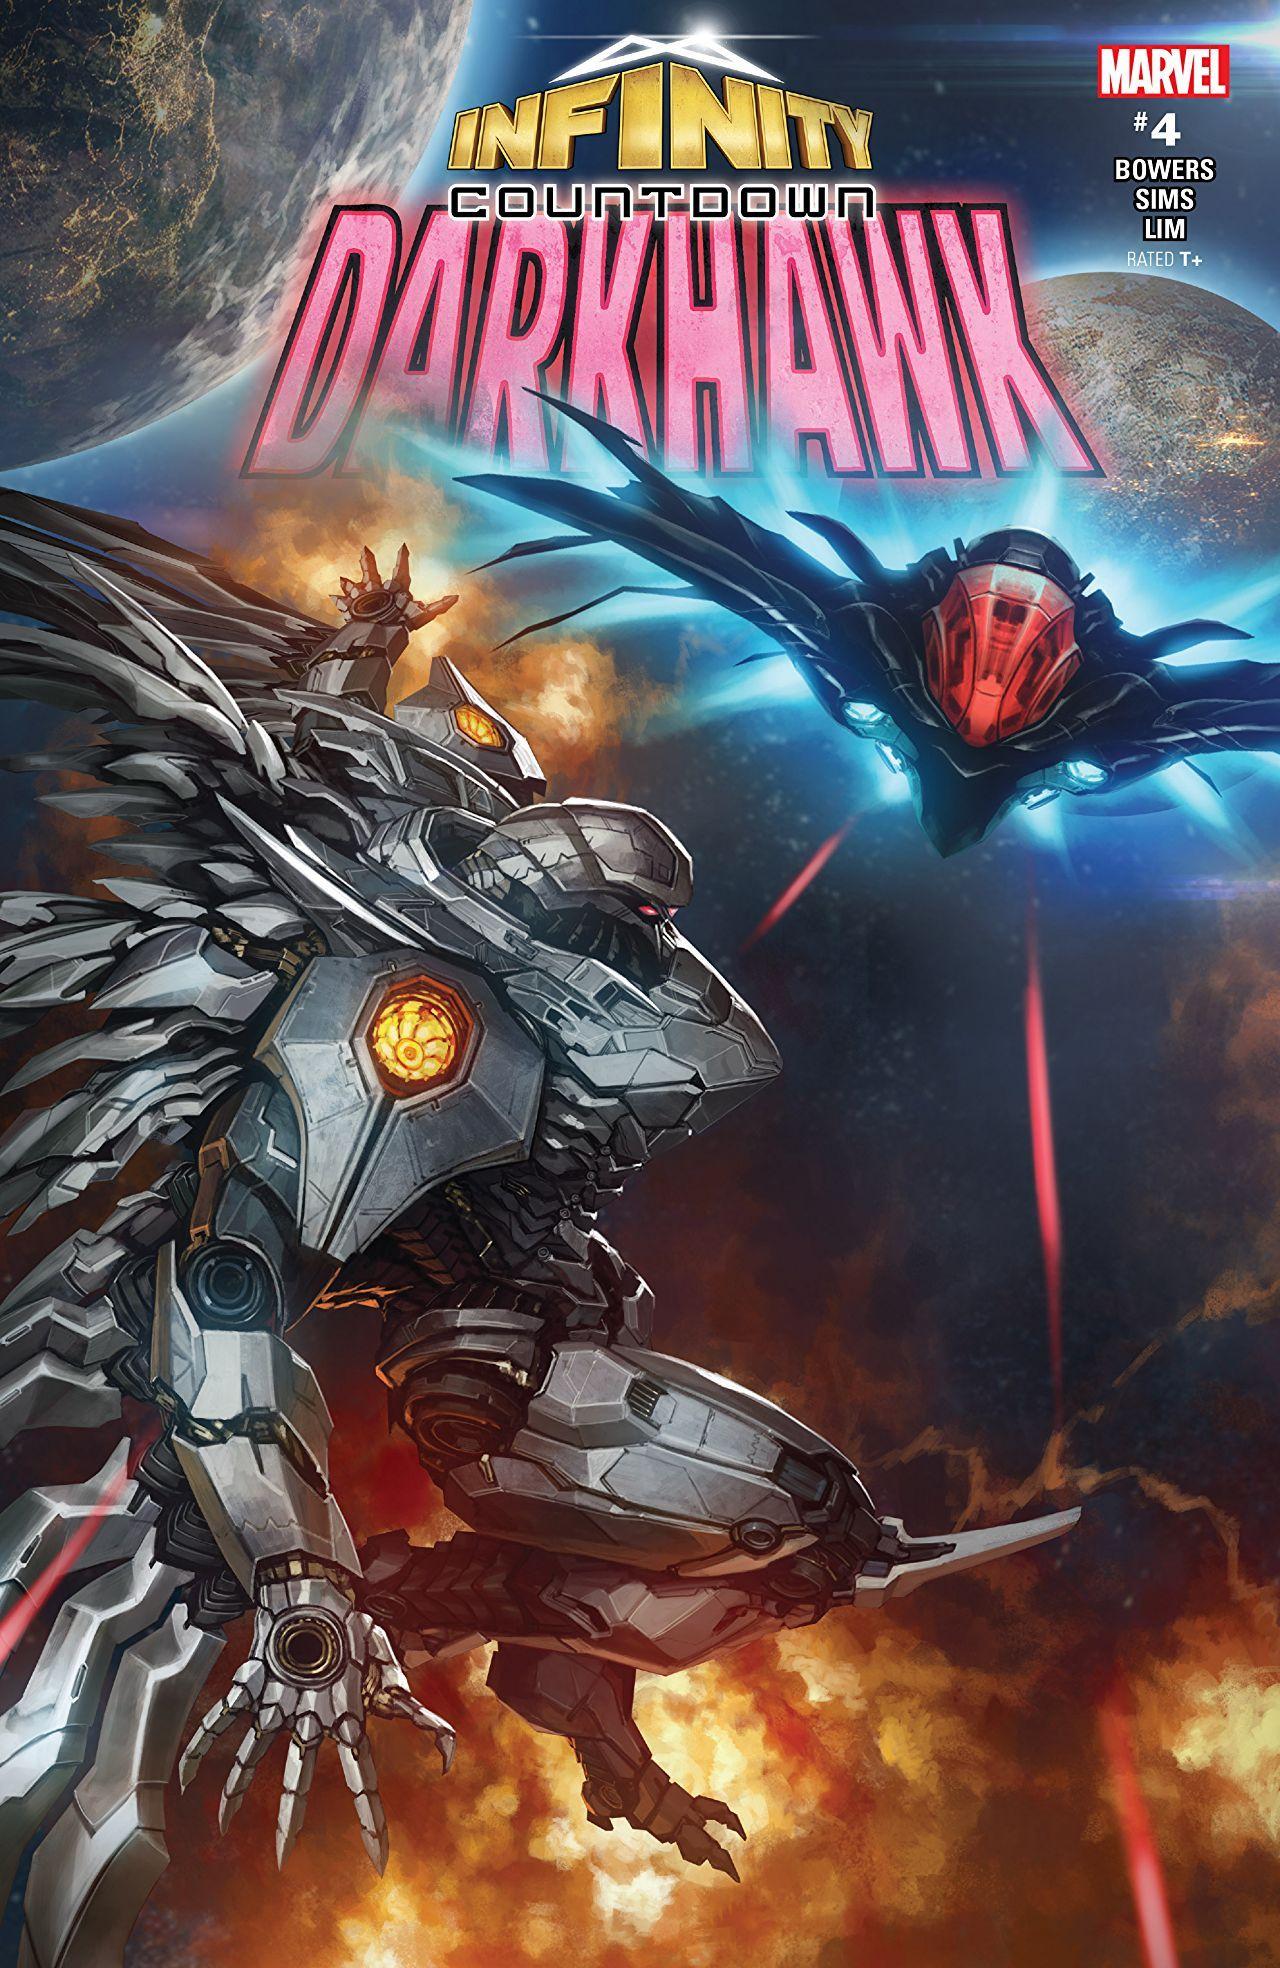 Infinity Countdown Darkhawk (2018) 4 (of 4) Comics